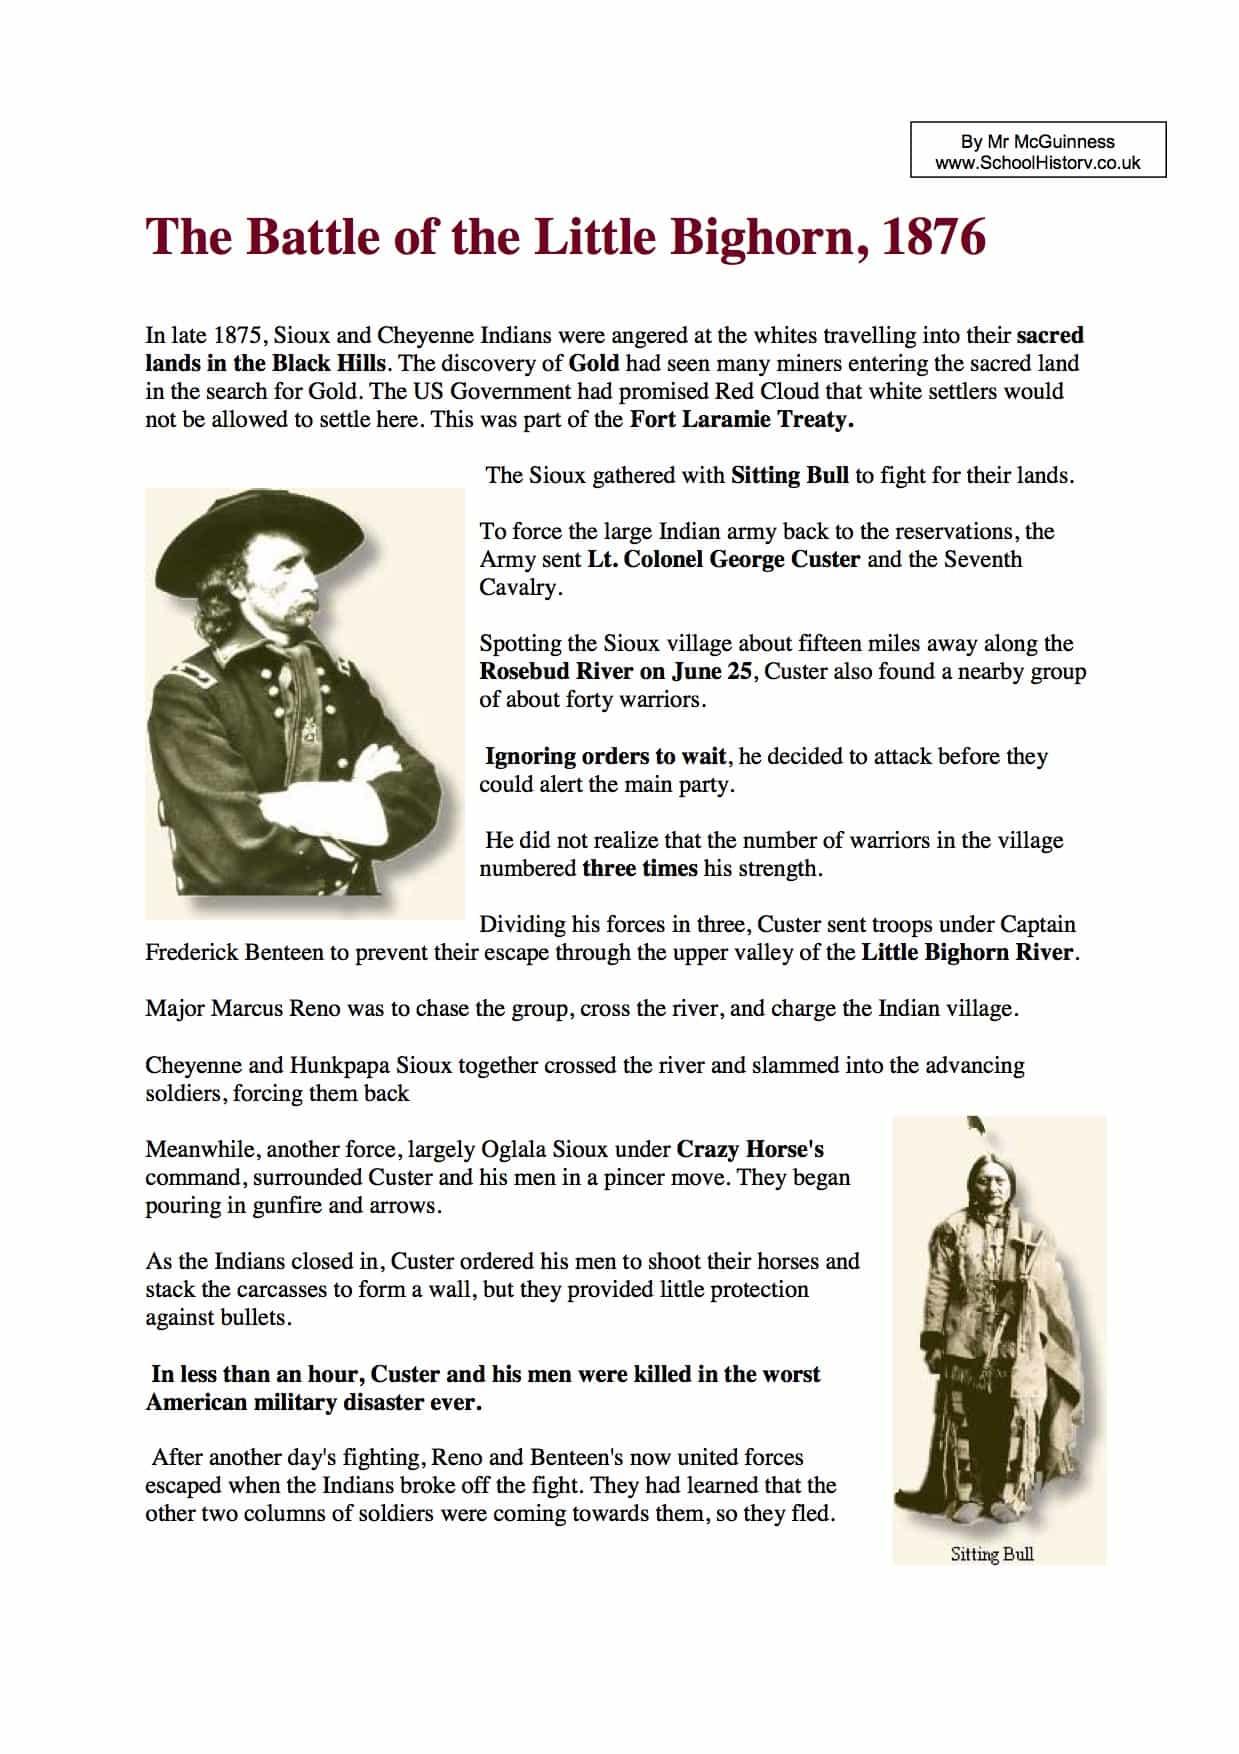 Little Bighorn Key Facts Amp Information